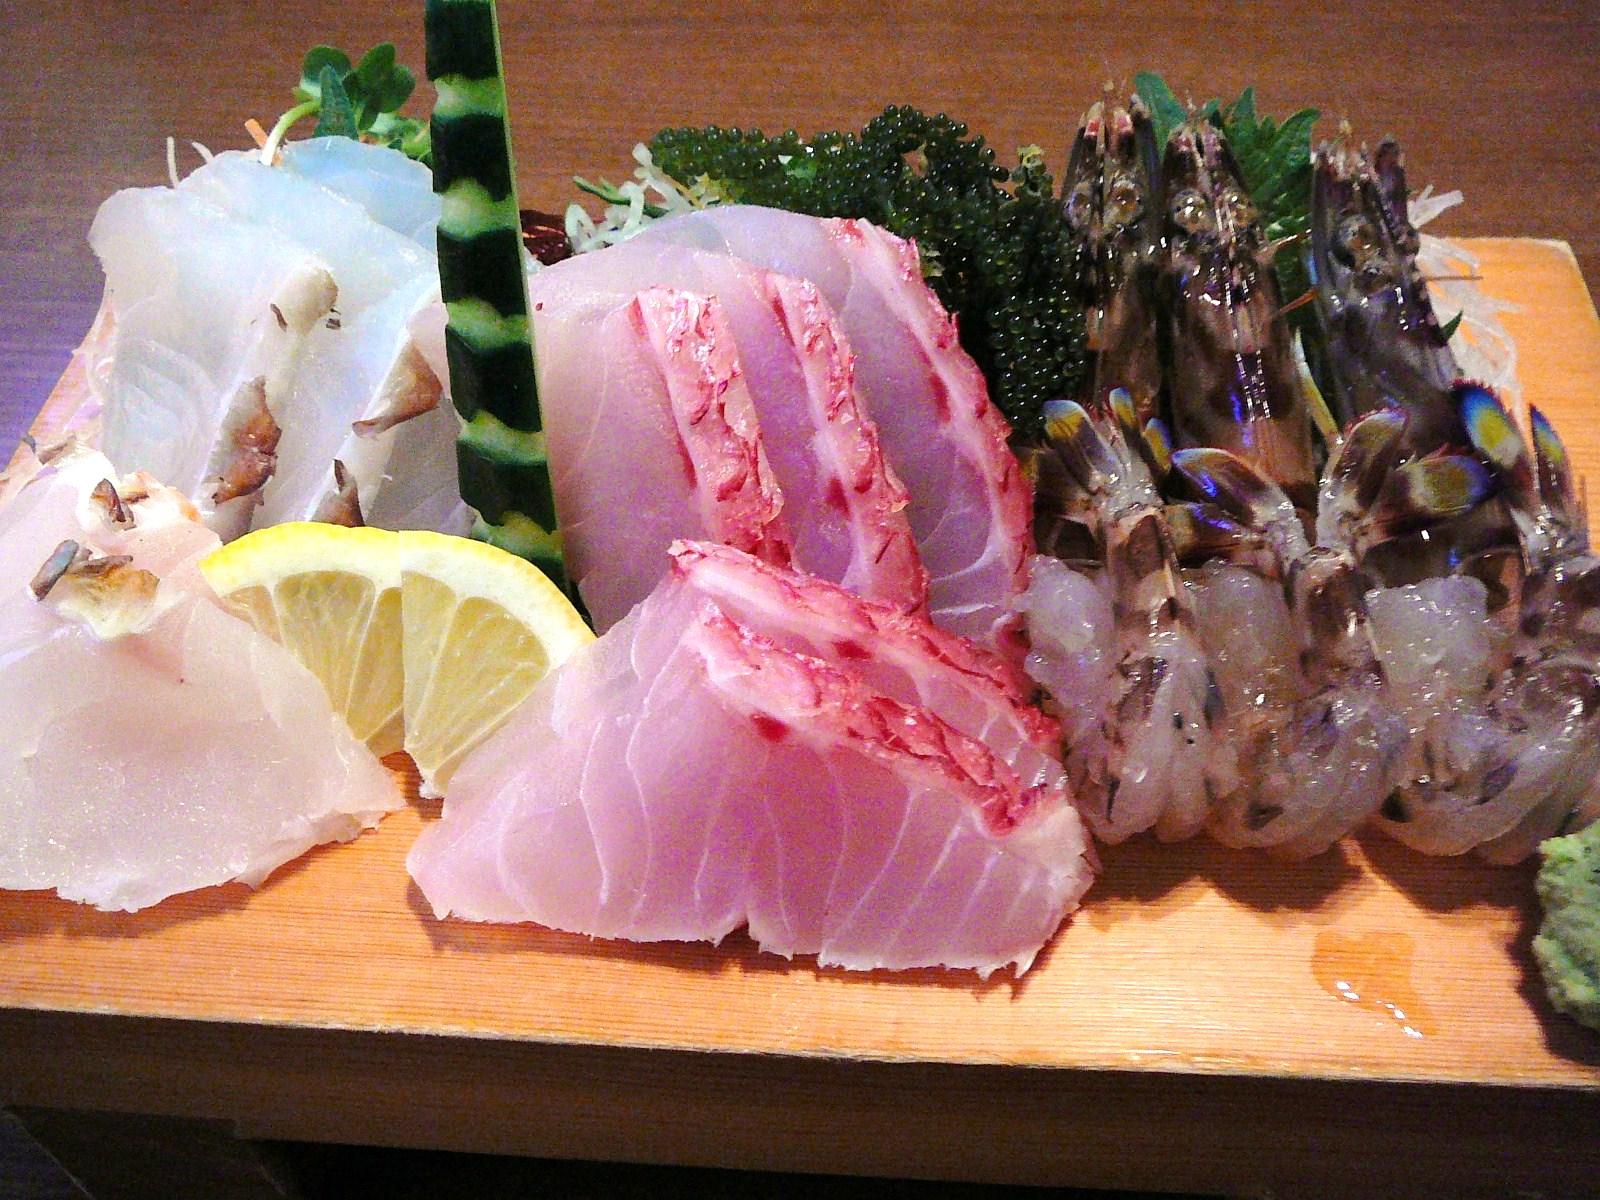 japanese-fish-sex-tyra-banks-sex-pics